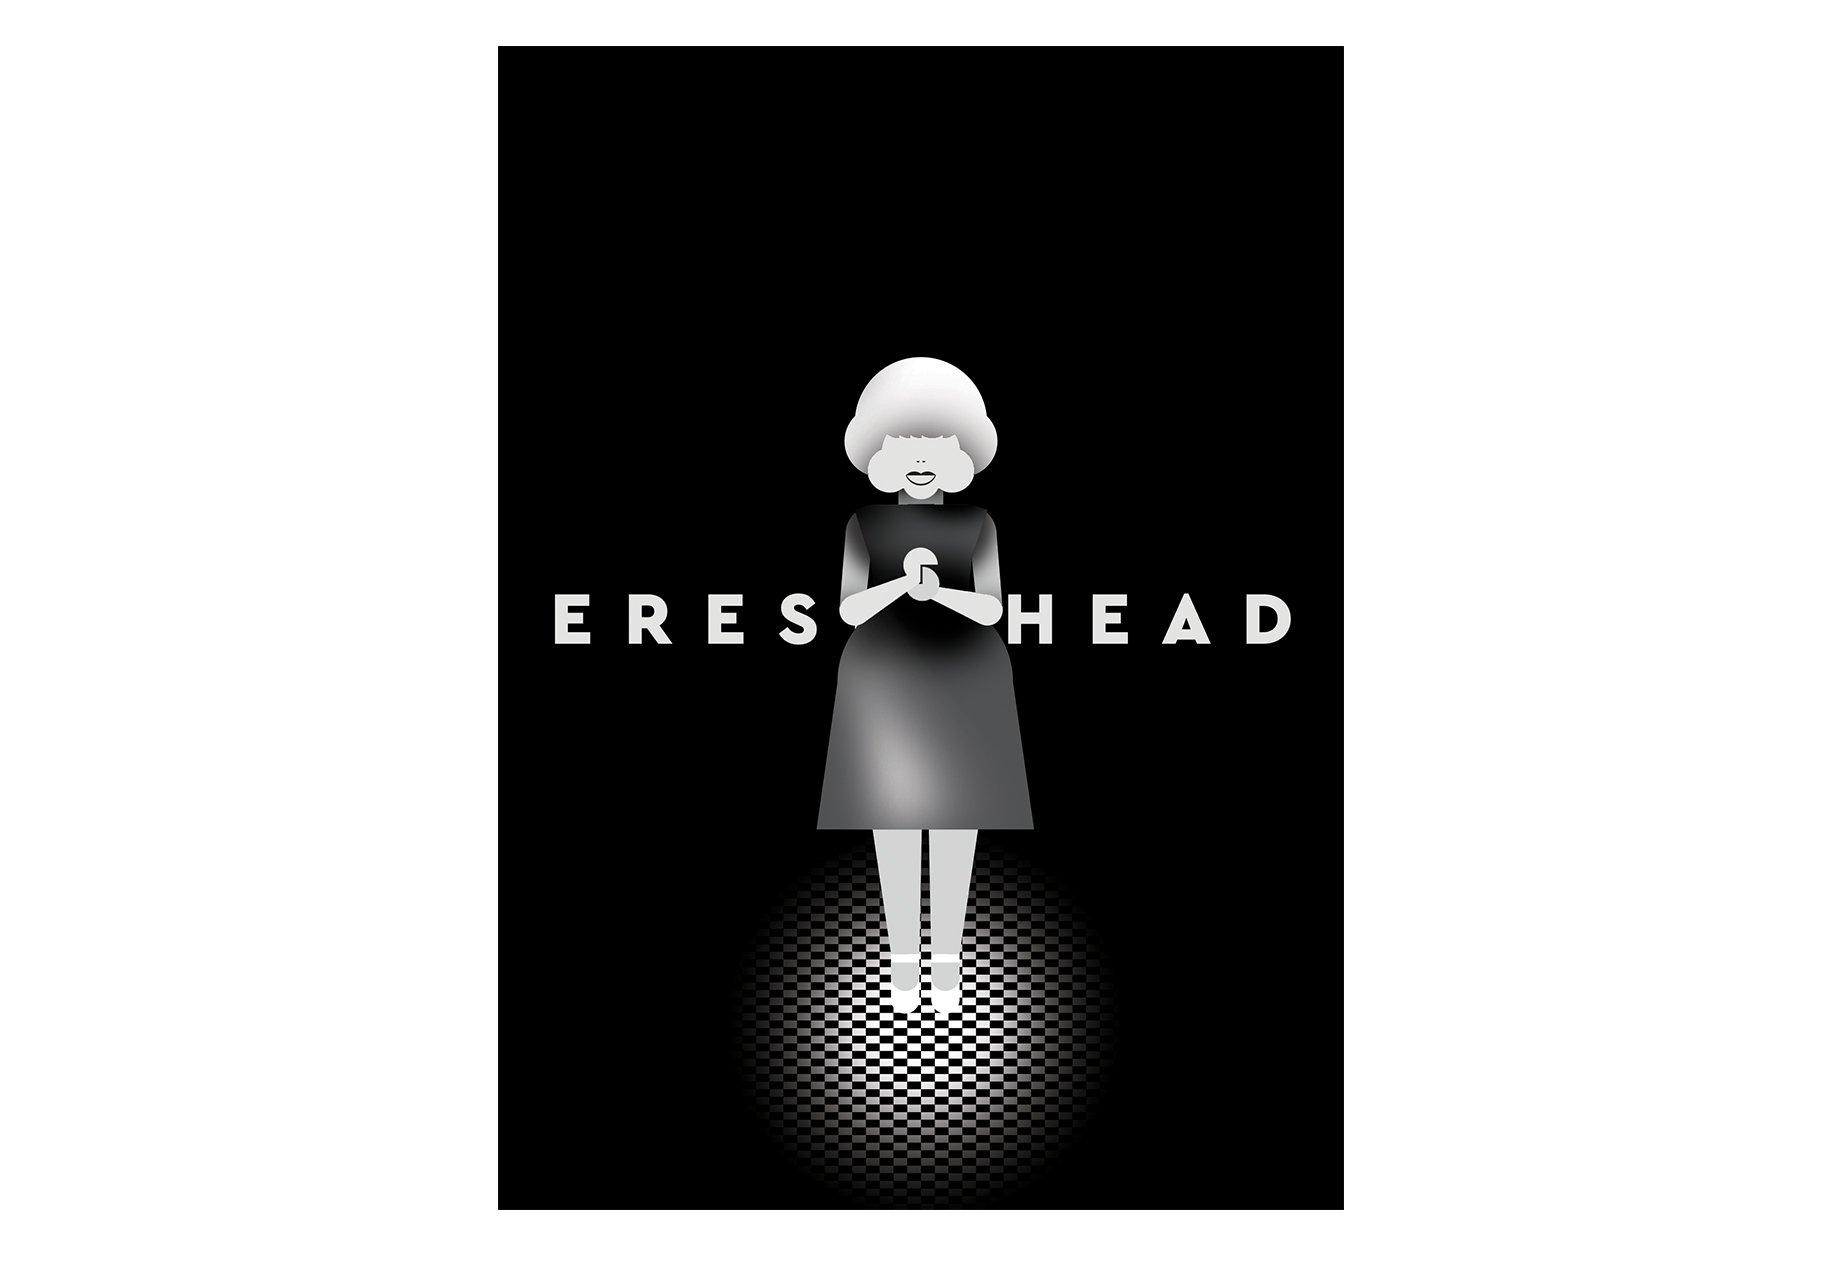 ereserhead-poster-illustration-alice-iuri